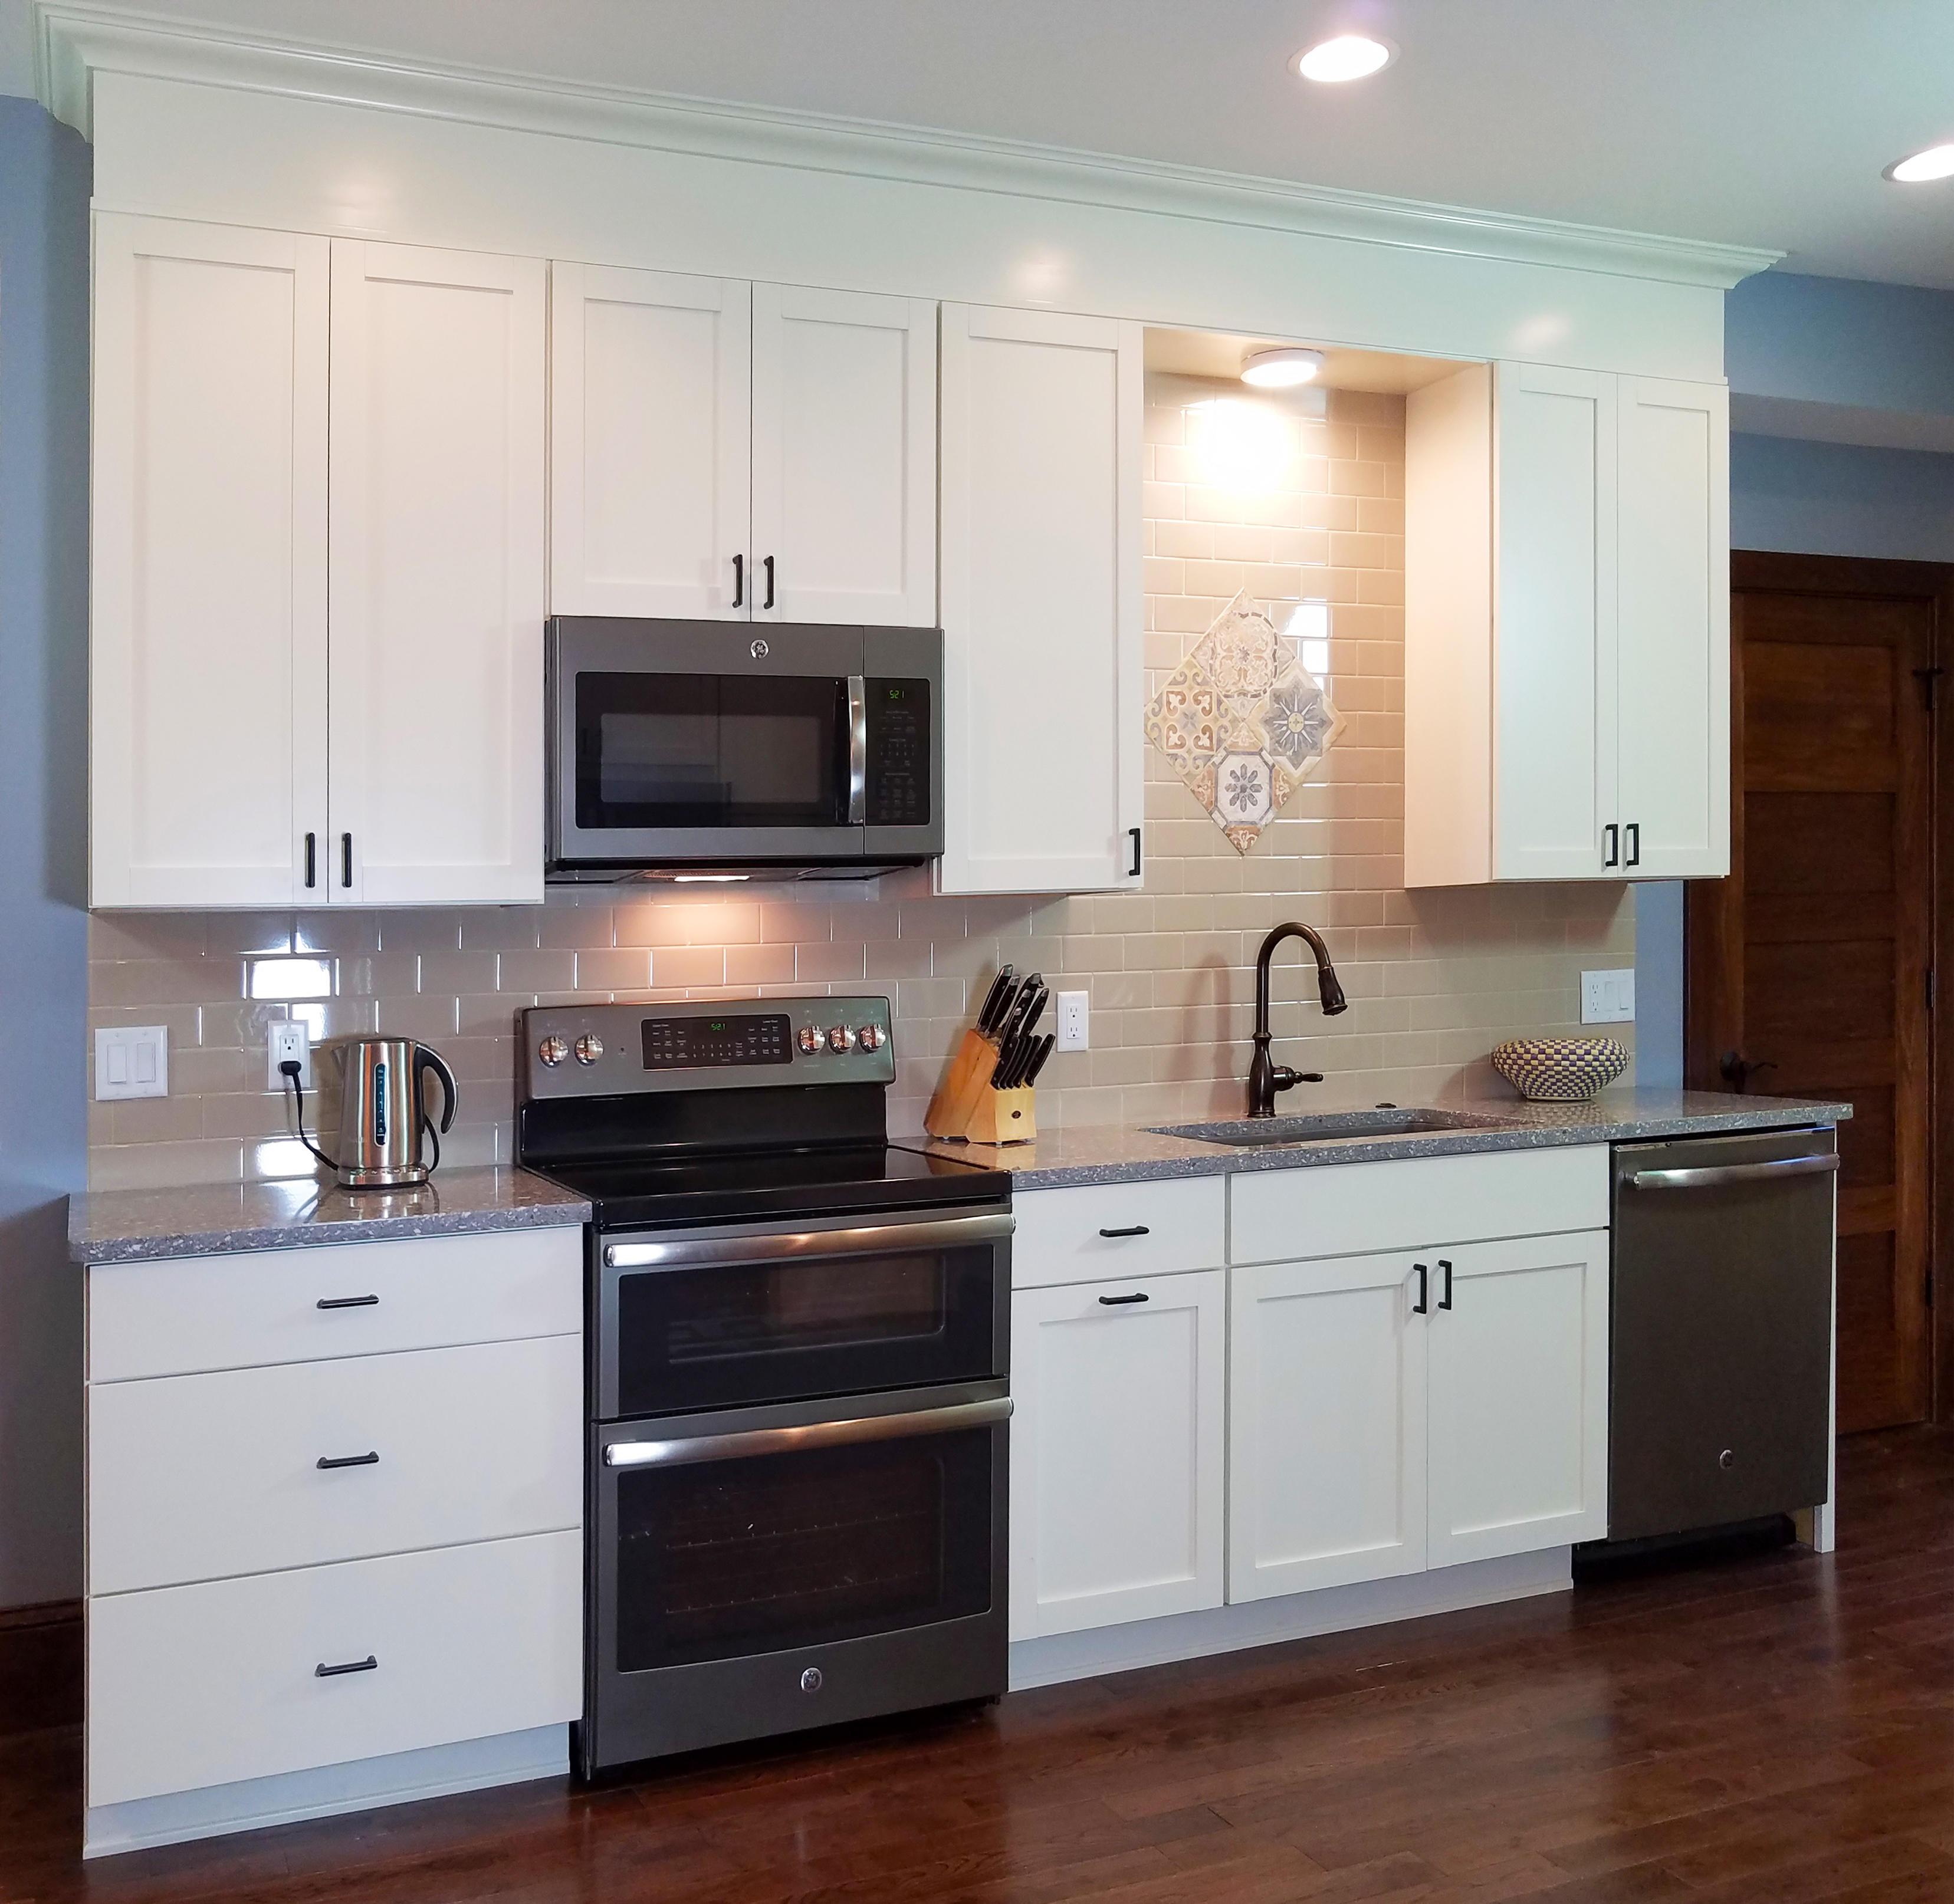 DC Interiors & Renovations image 1